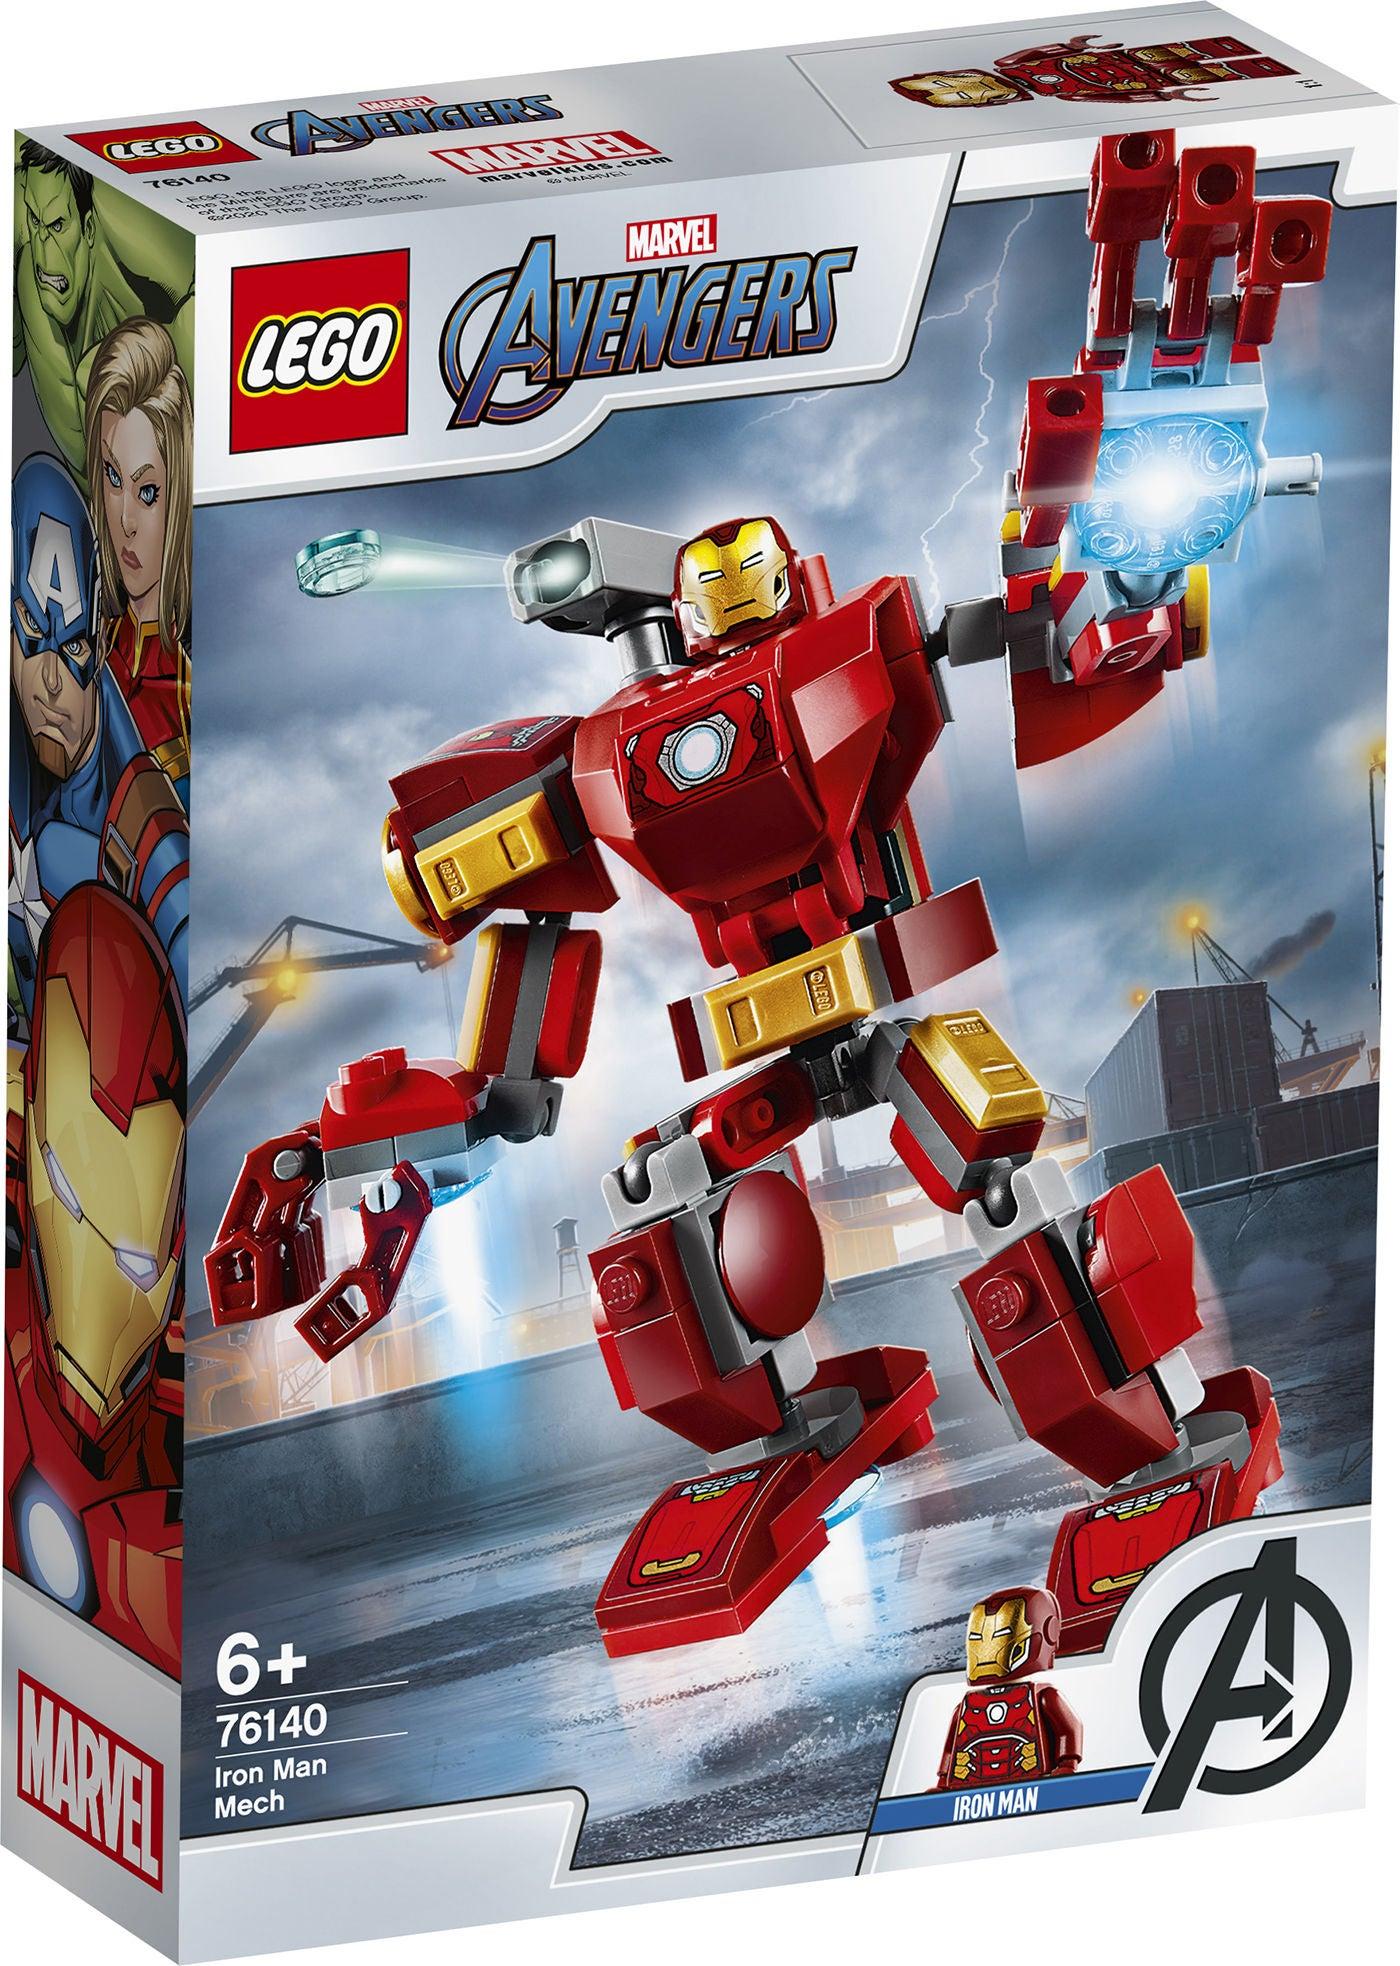 LEGO Super Heroes 76140 Iron Man Mech